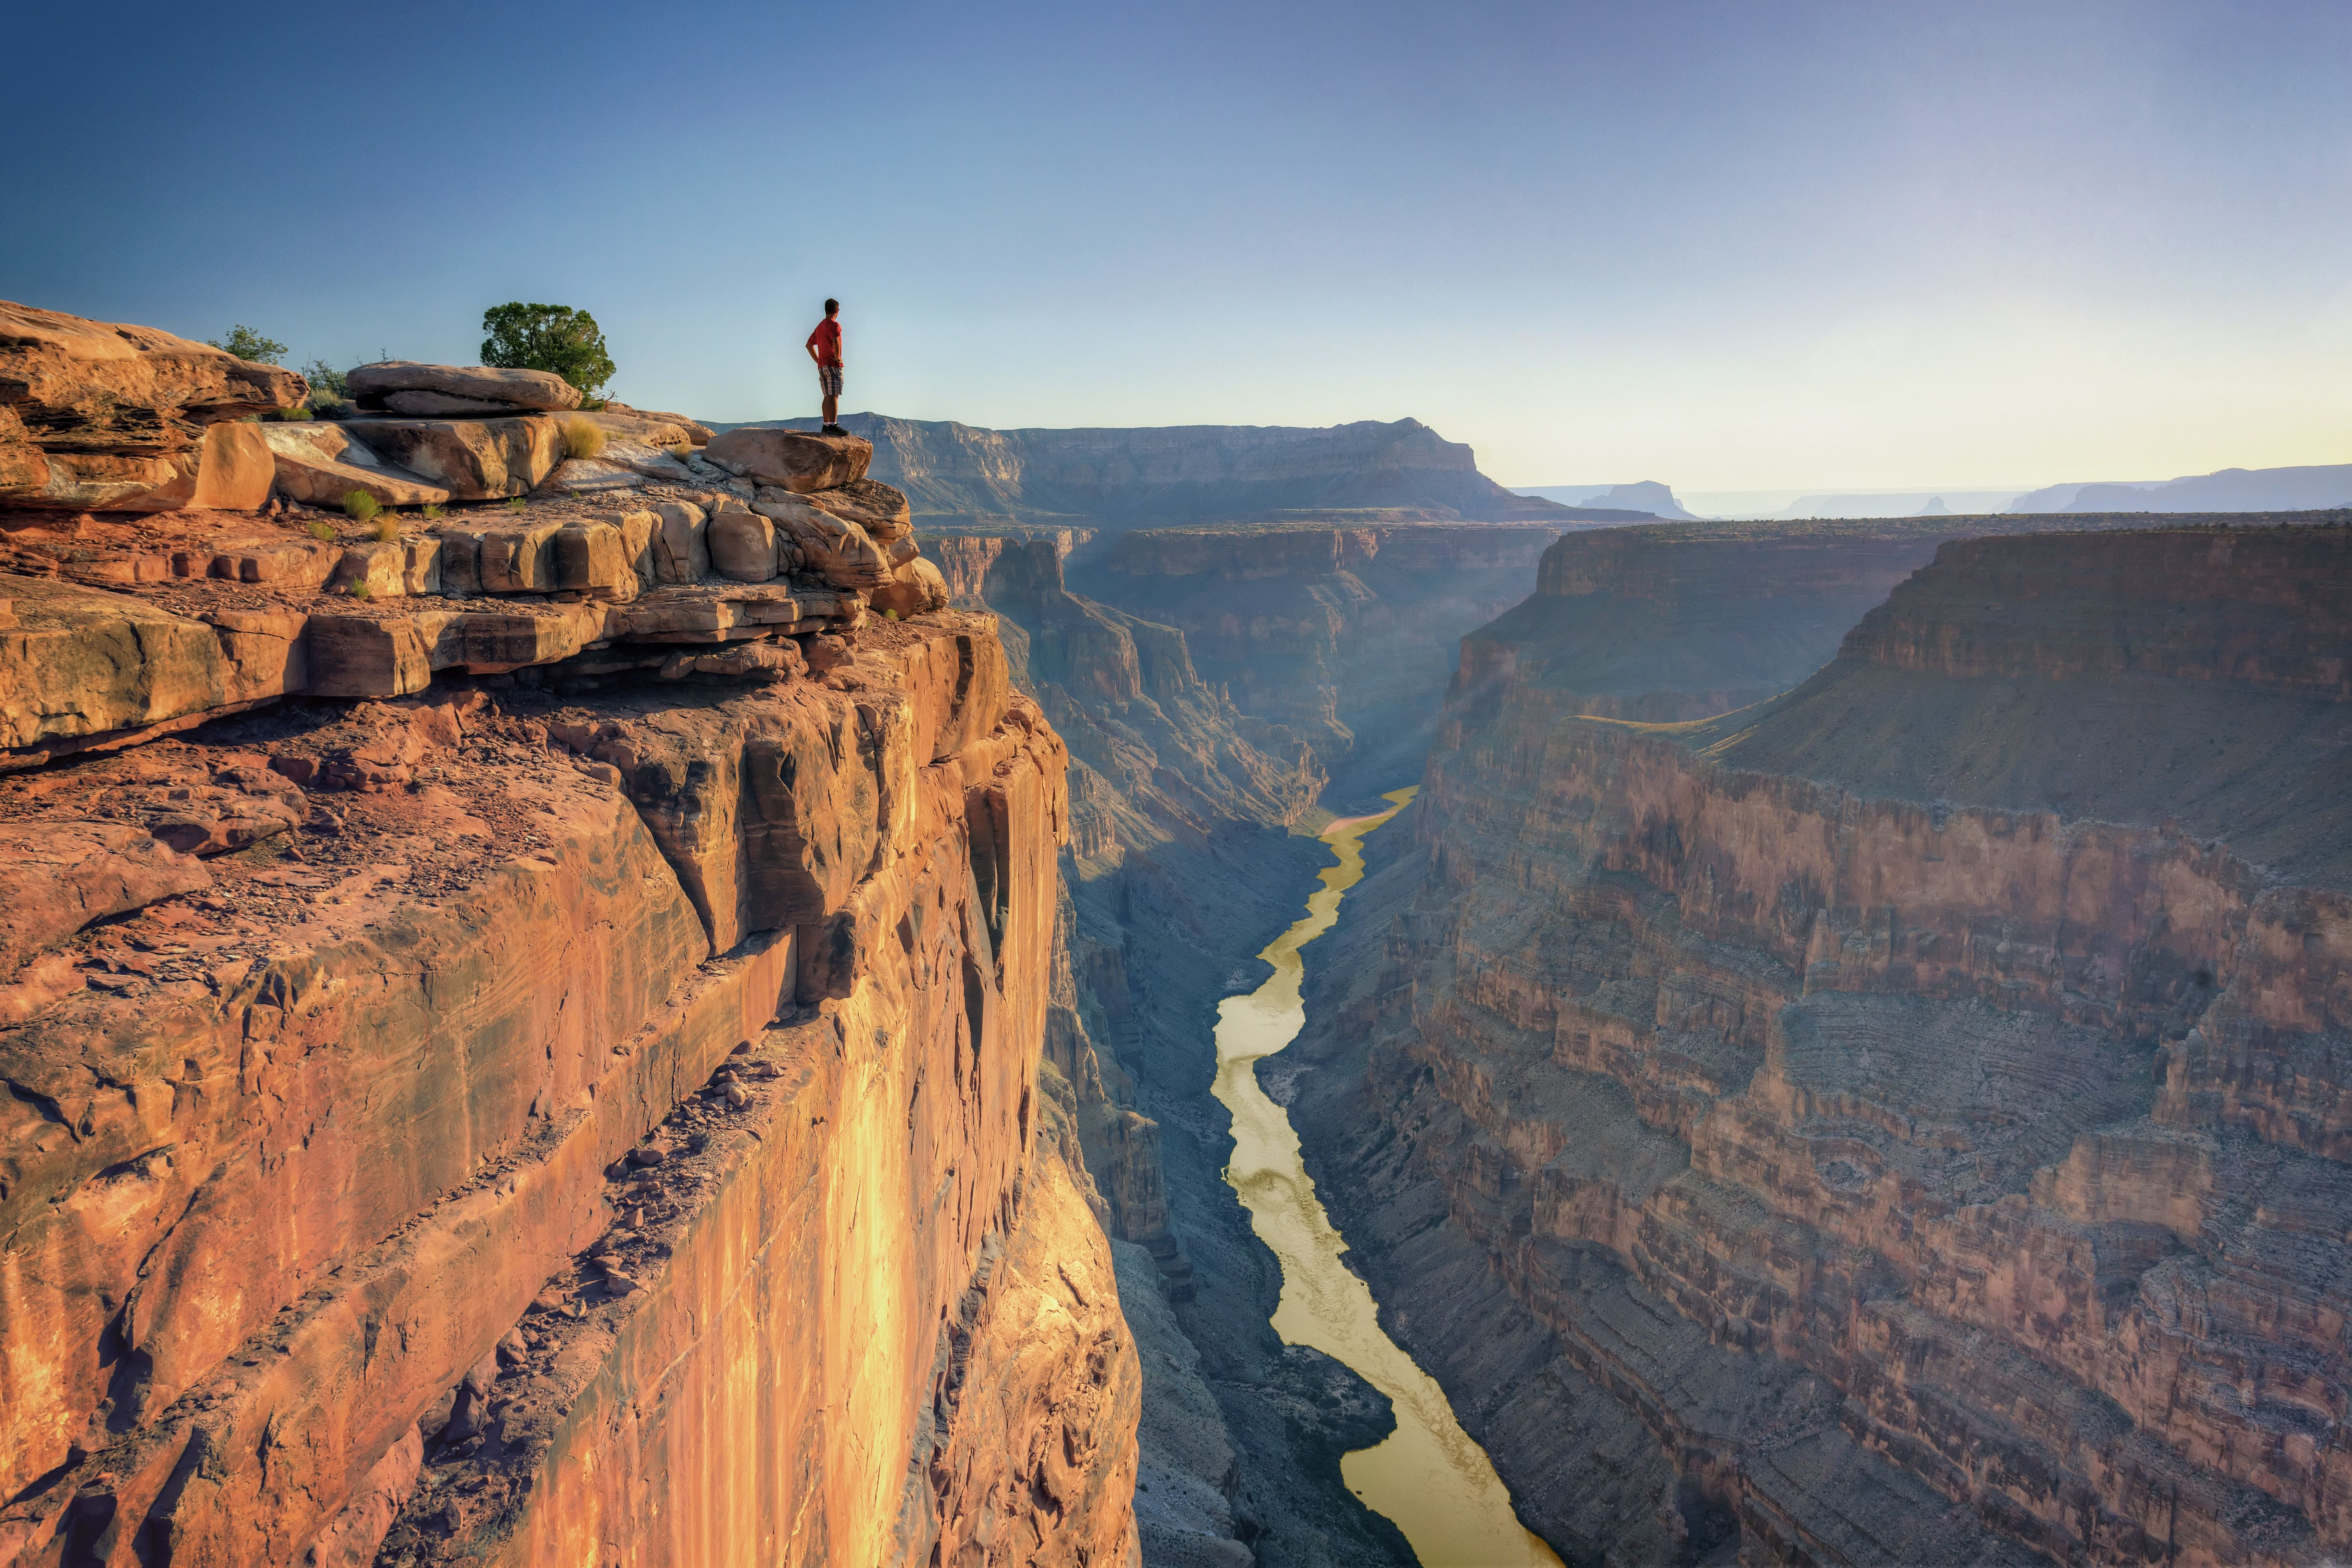 USA, Arizona, Grand Canyon National Park (North Rim), Toroweap (Tuweep) Overlook, Hiker on cliff edge (MR)